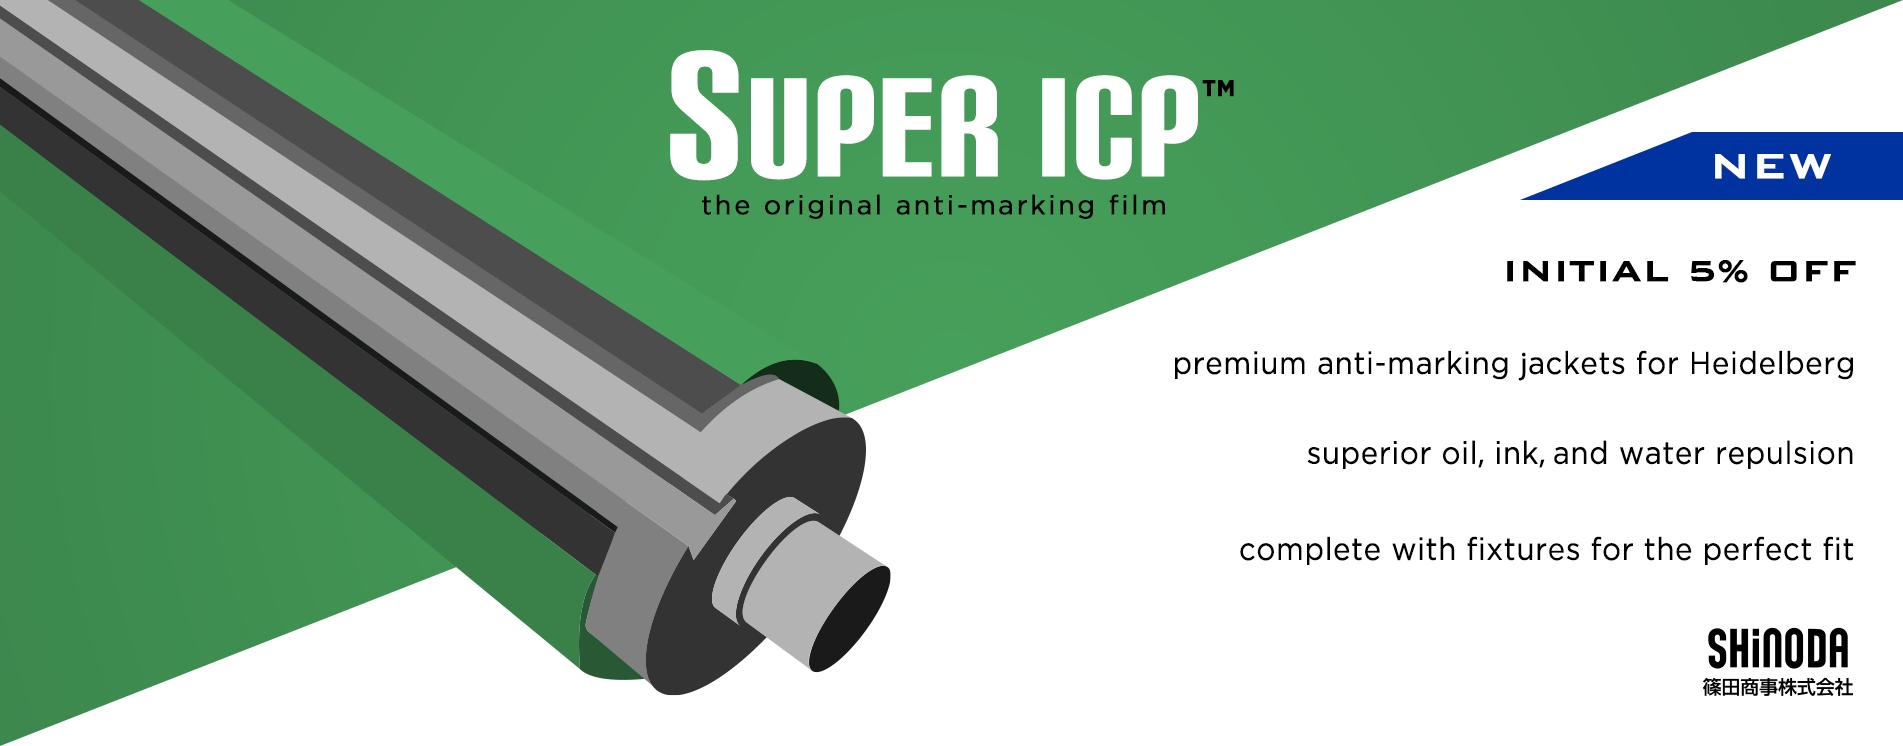 Save 5% OFF NEW Super ICP™ Premium Anti-Marking Jackets